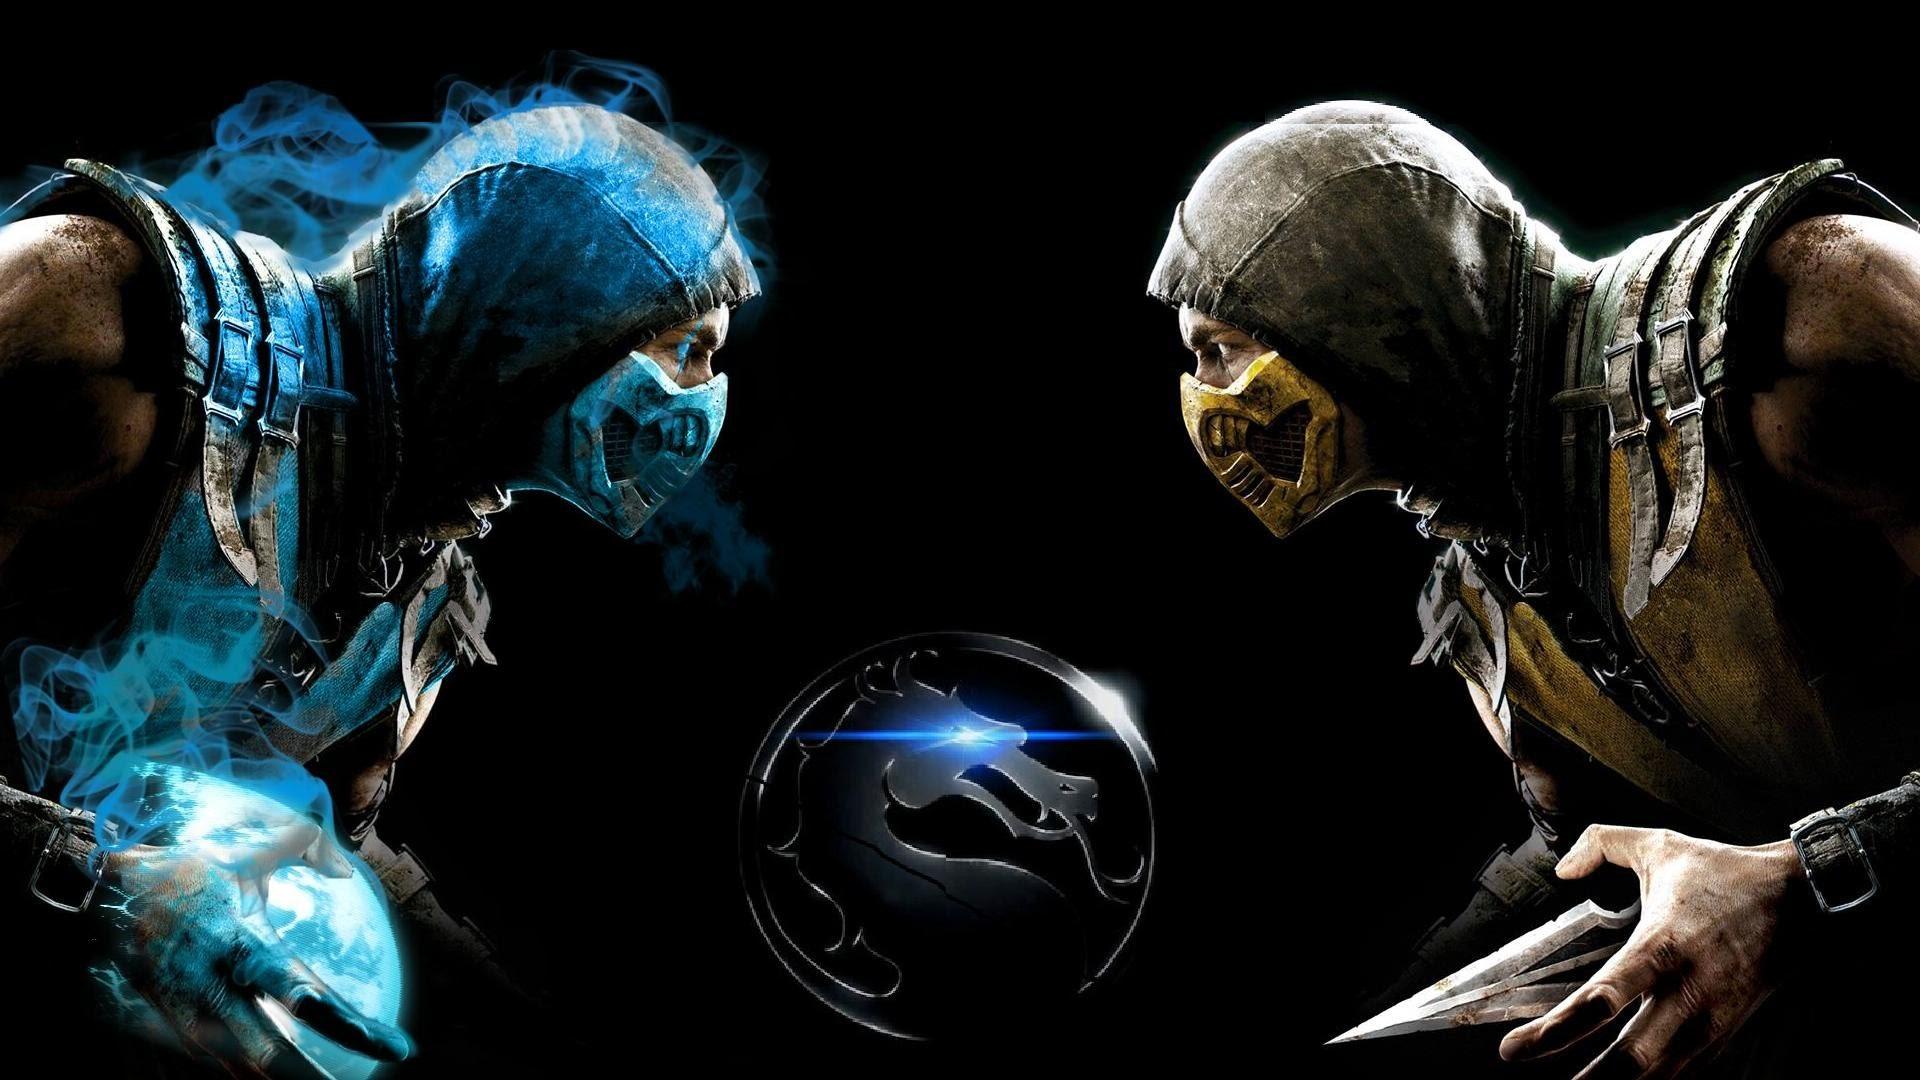 Mortal kombat 9 - Scorpion vs Sub Zero Vs Kratos - YouTube